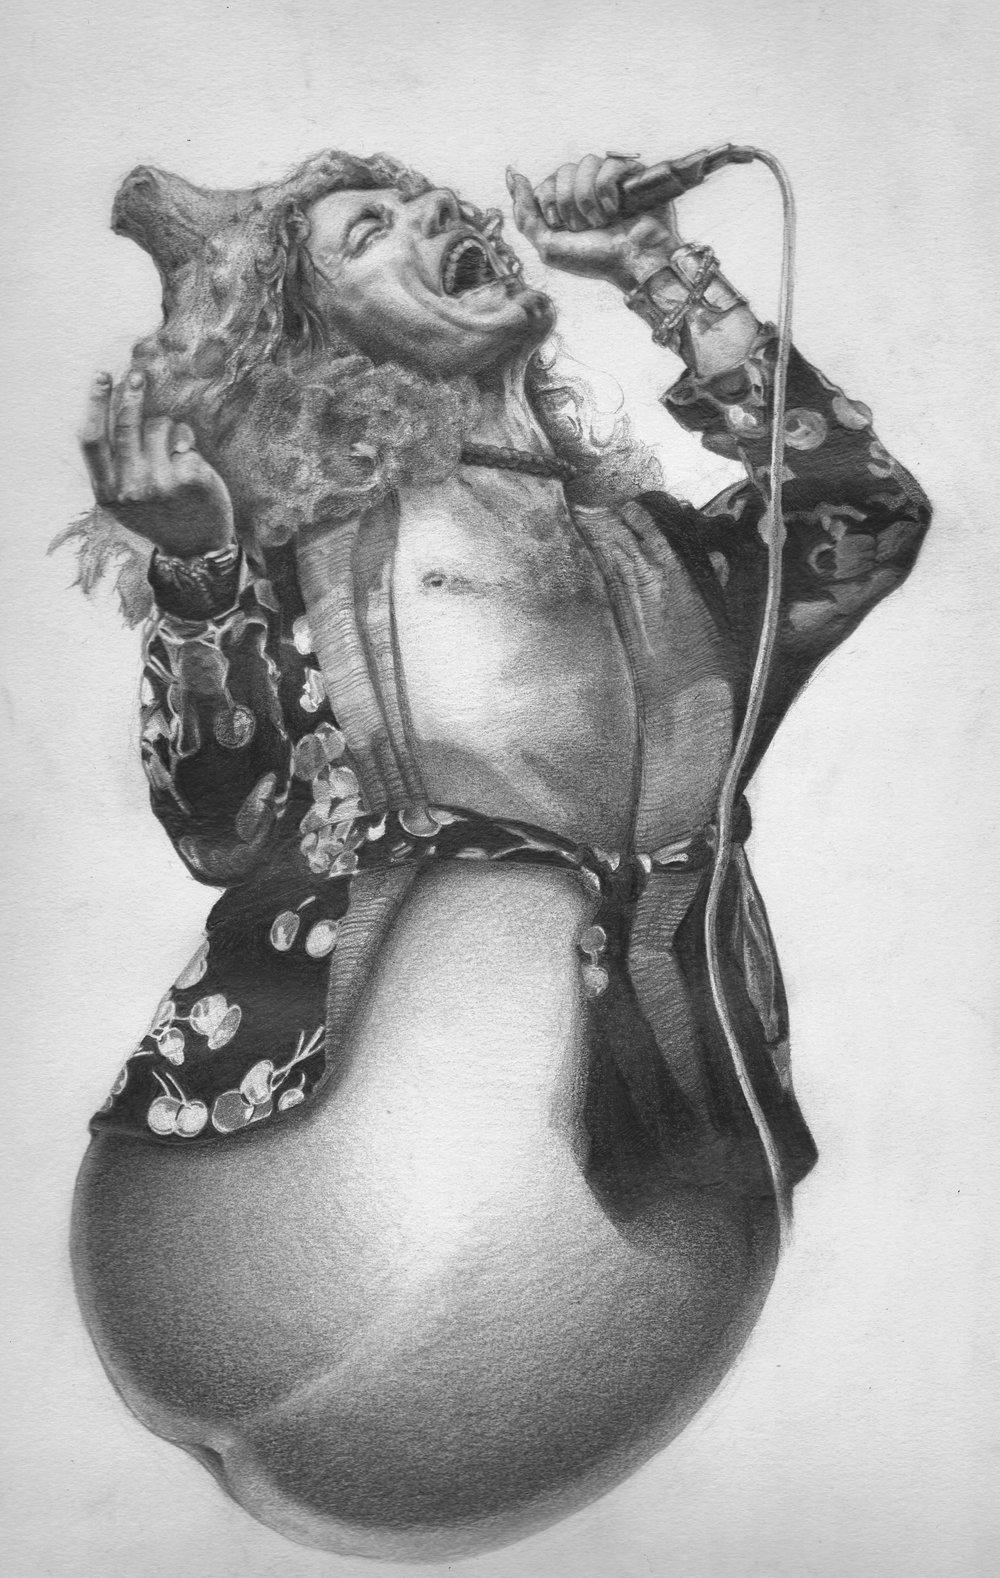 Robert Eggplant - Graphite